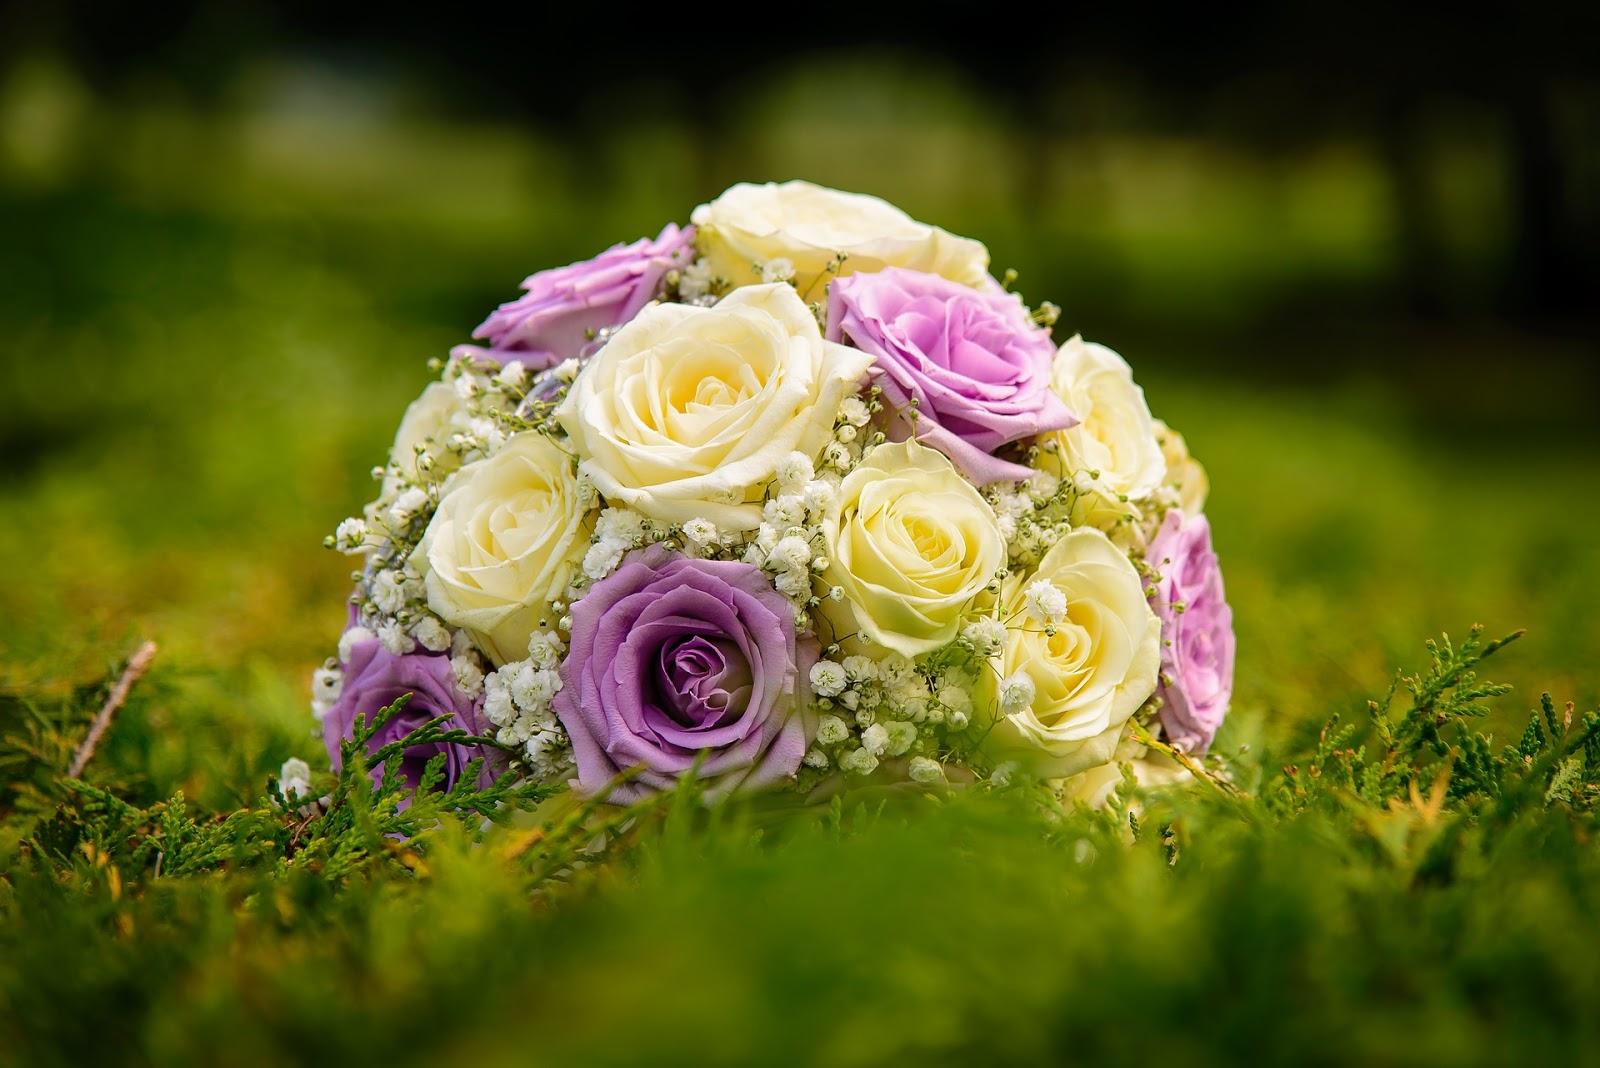 15 Gambar Bunga Mawar Terindah Server Tanamania Portal